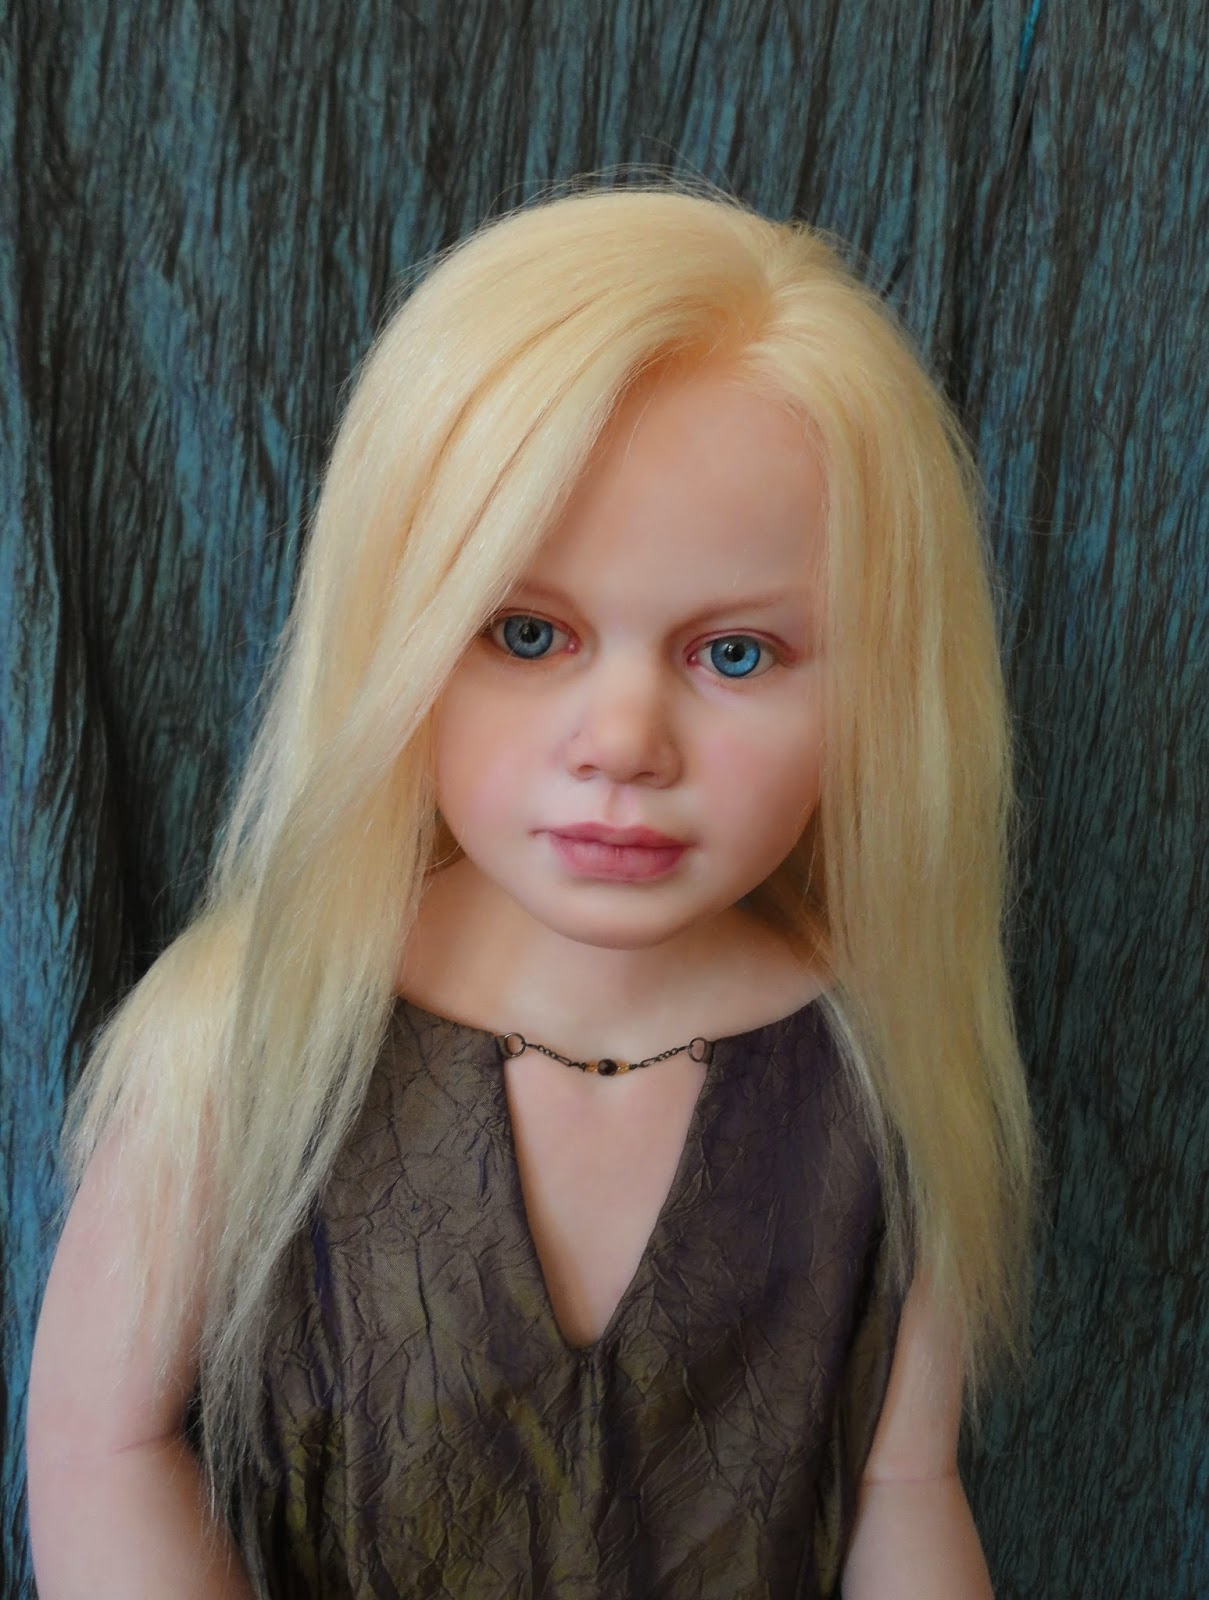 Anya's Originals Reborns and OOAK Art Dolls: New ...: http://anyadolls.blogspot.com/2014/11/new-gabriella-lifesize-reborn-doll.html